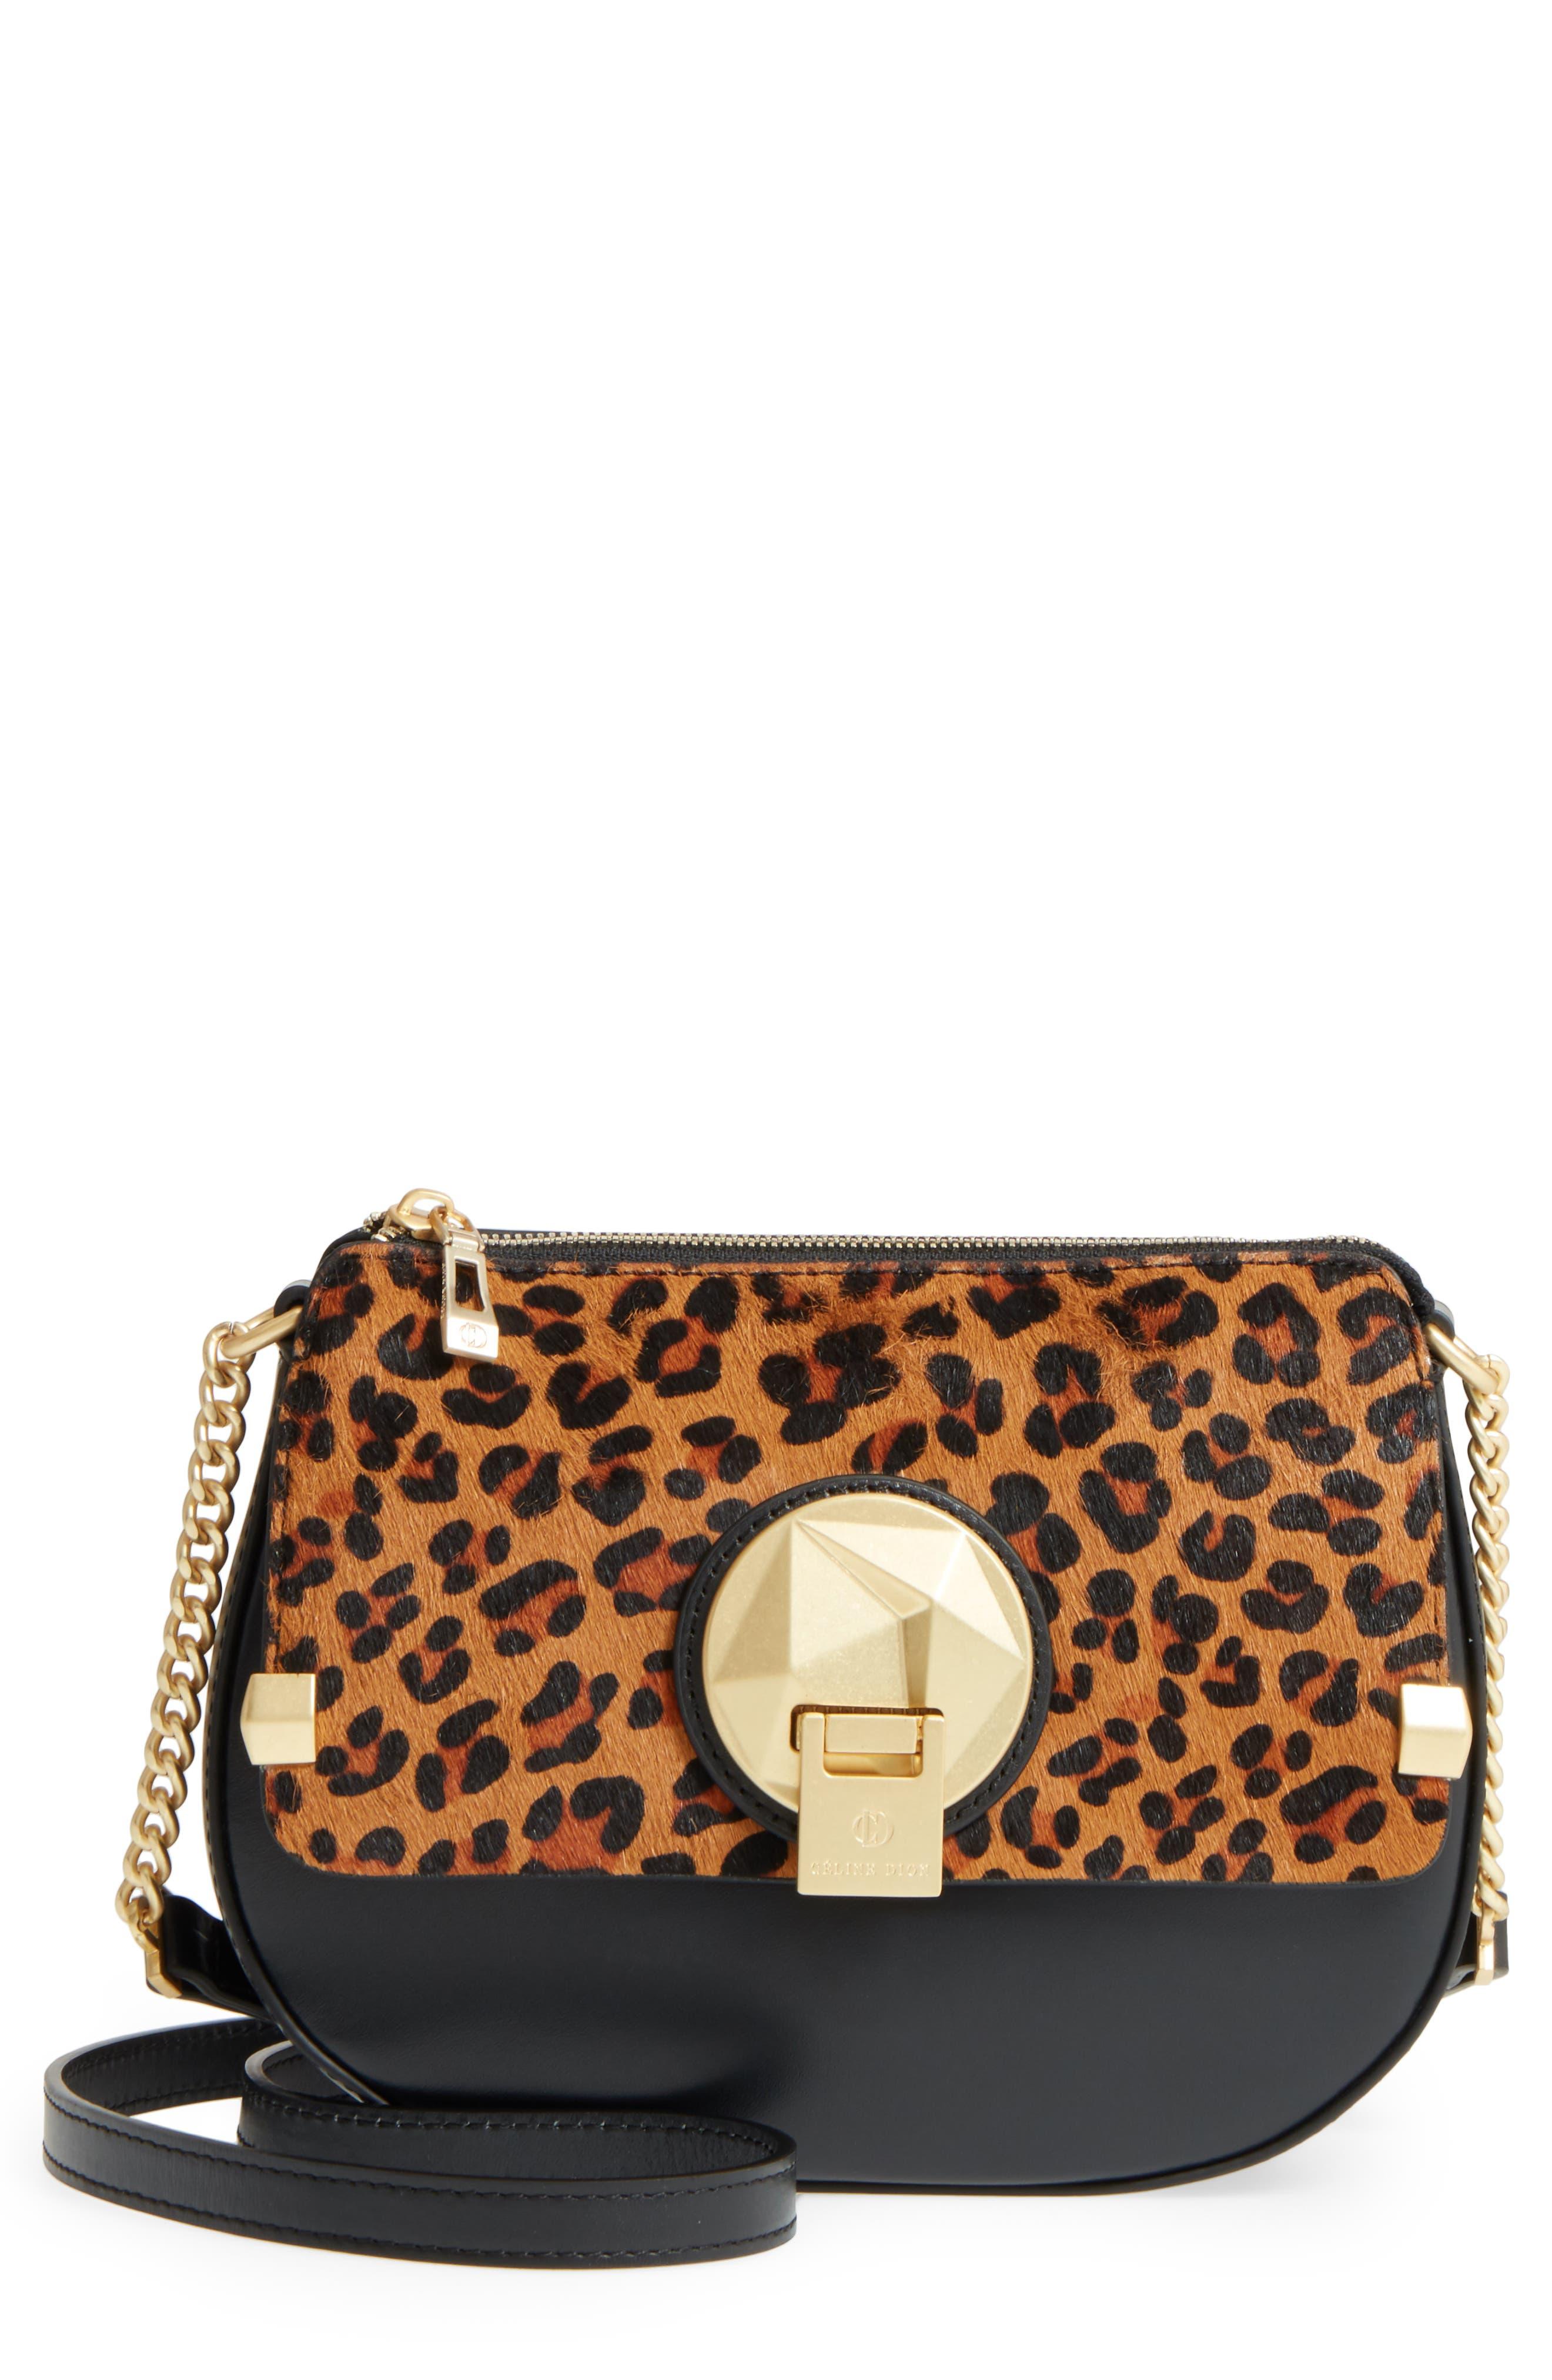 Céline Dion Octave Leather Crossbody Bag,                         Main,                         color,